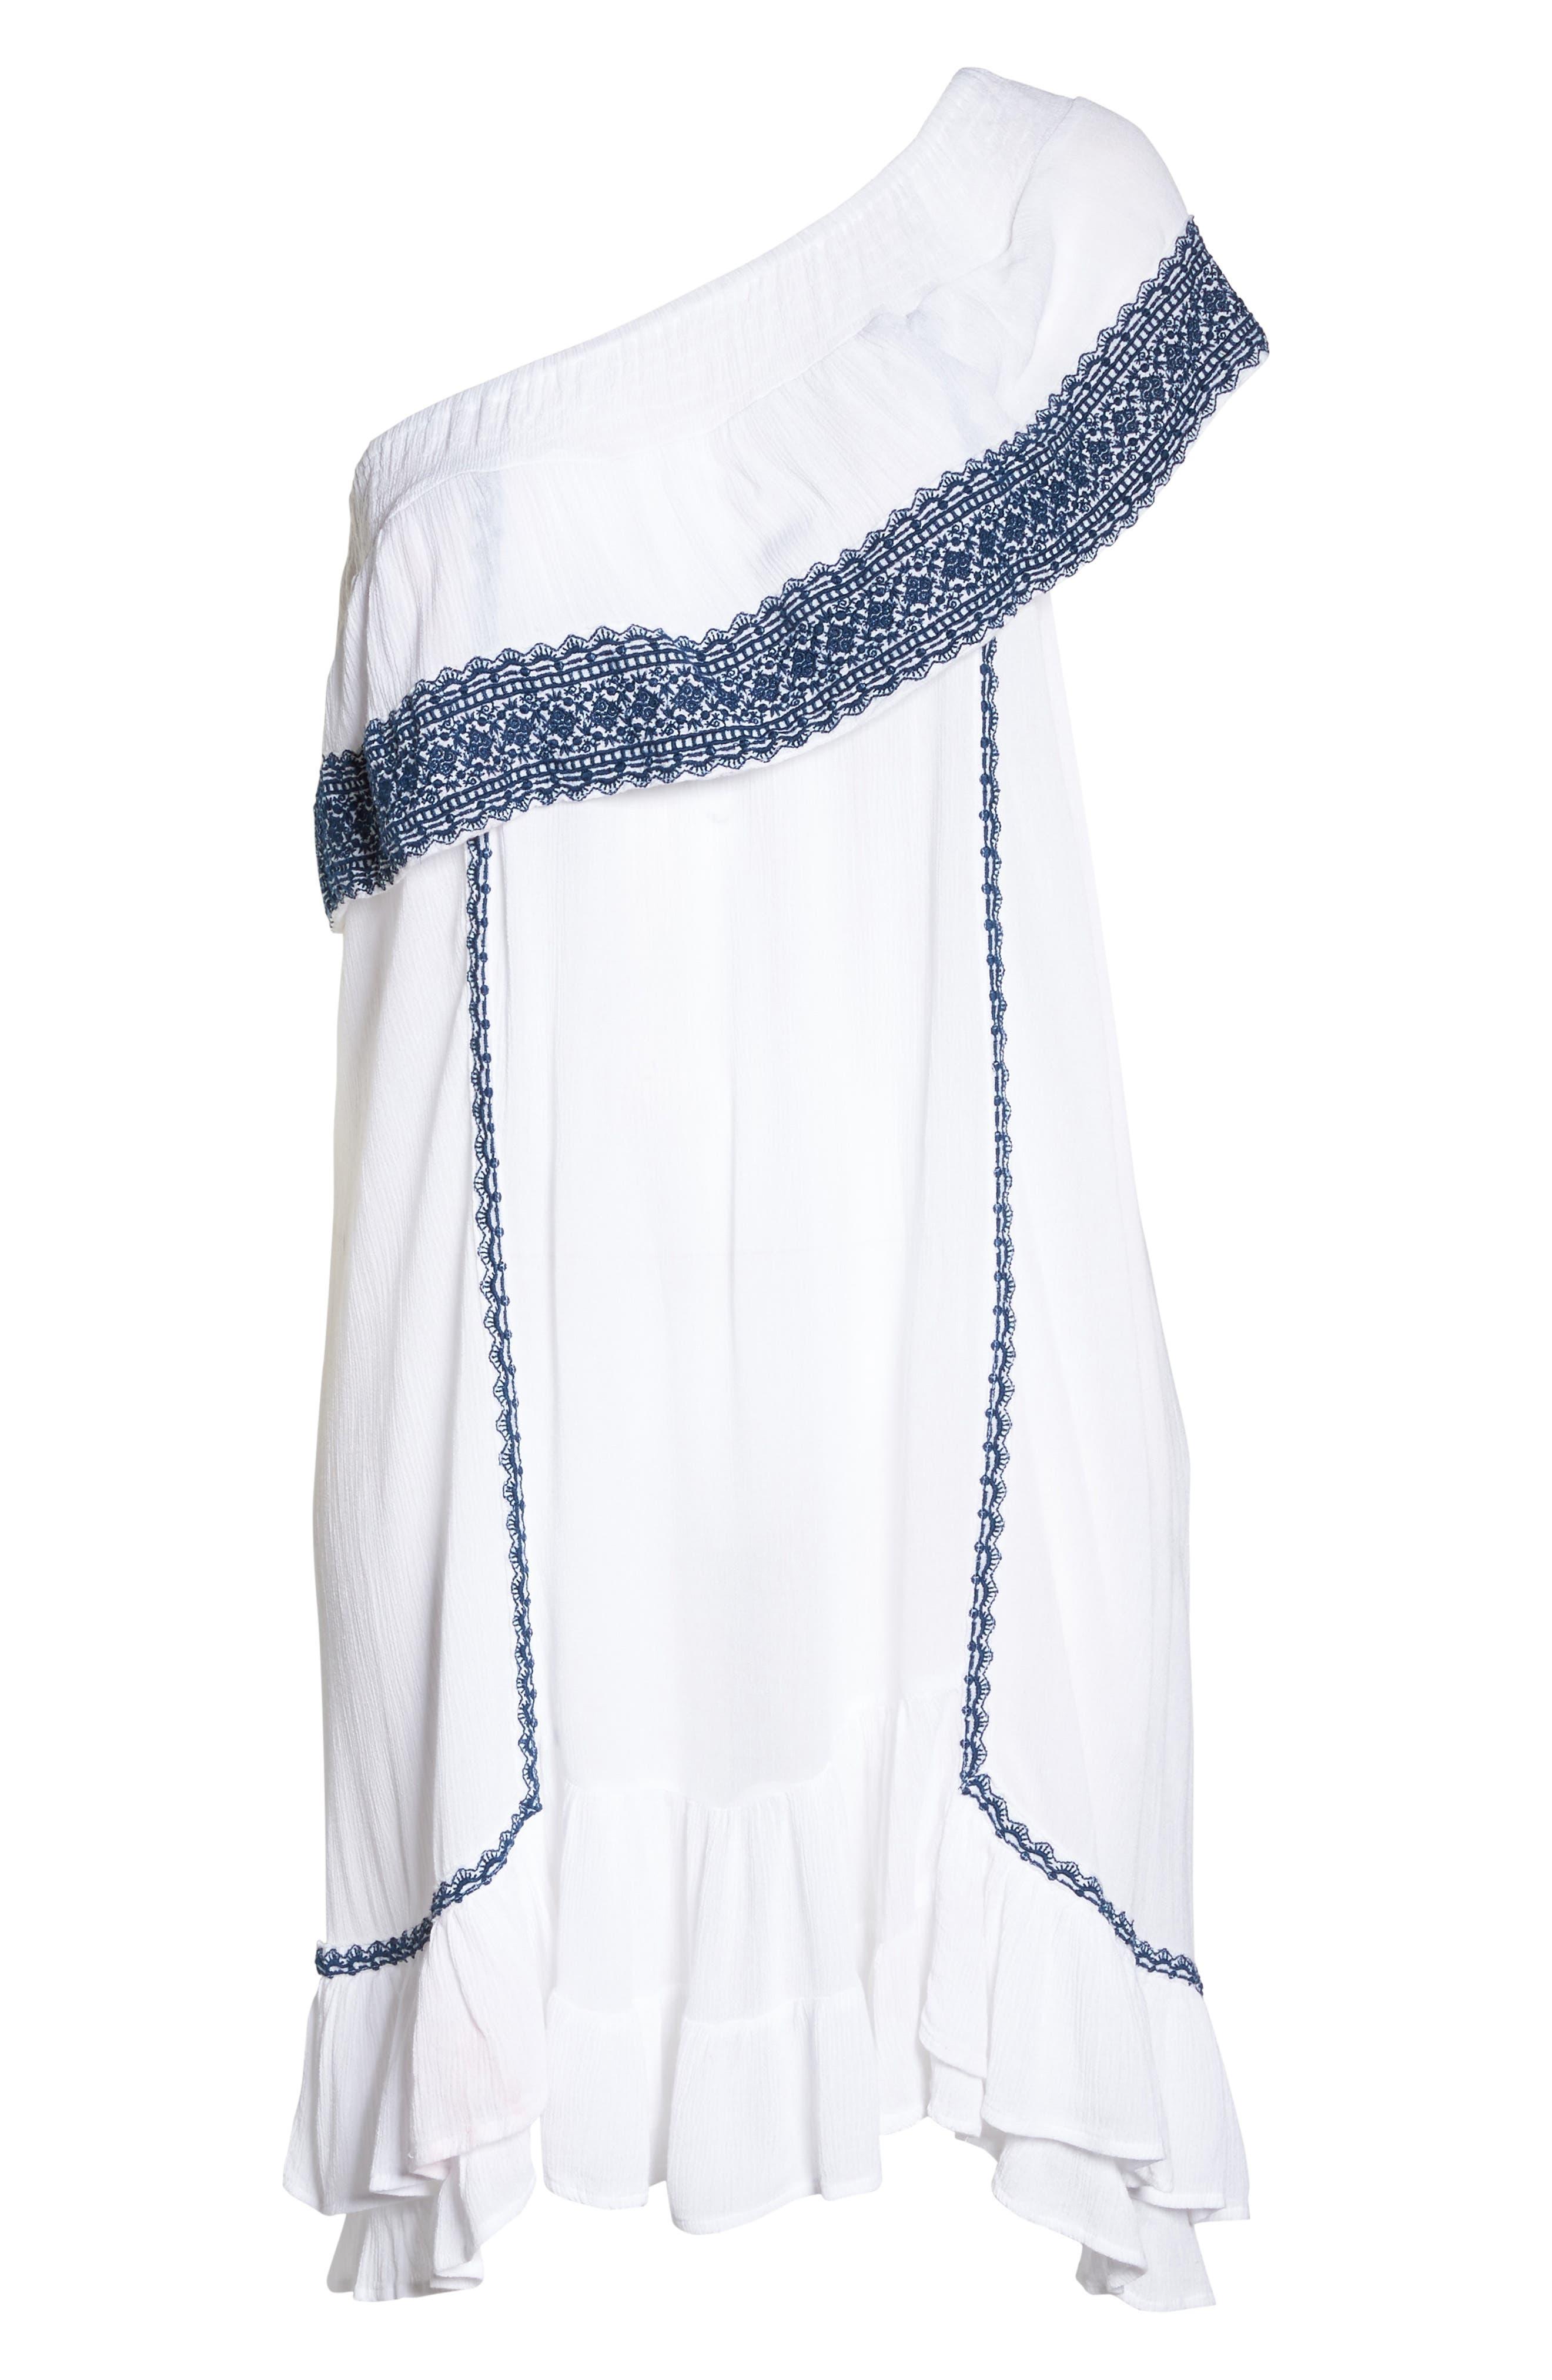 Gavin One-Shoulder Cover-Up Dress,                             Alternate thumbnail 12, color,